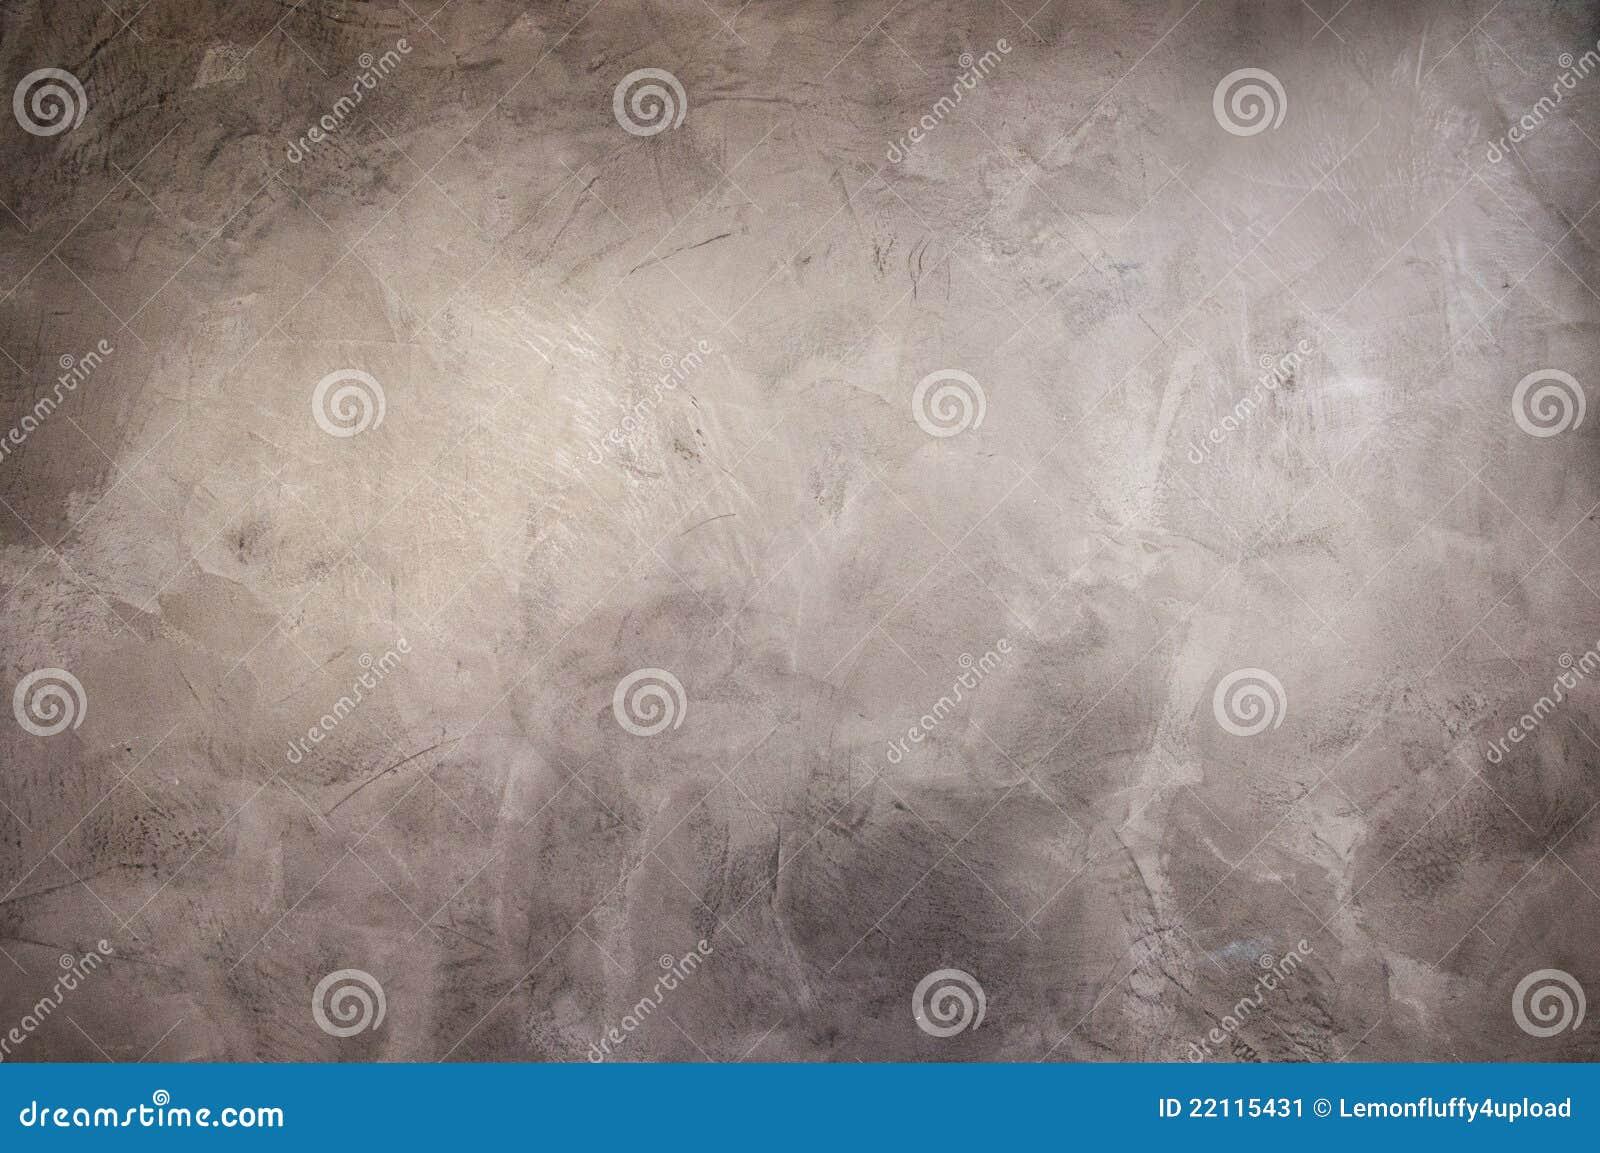 technique de peinture de tadelakt image stock image 22115431. Black Bedroom Furniture Sets. Home Design Ideas